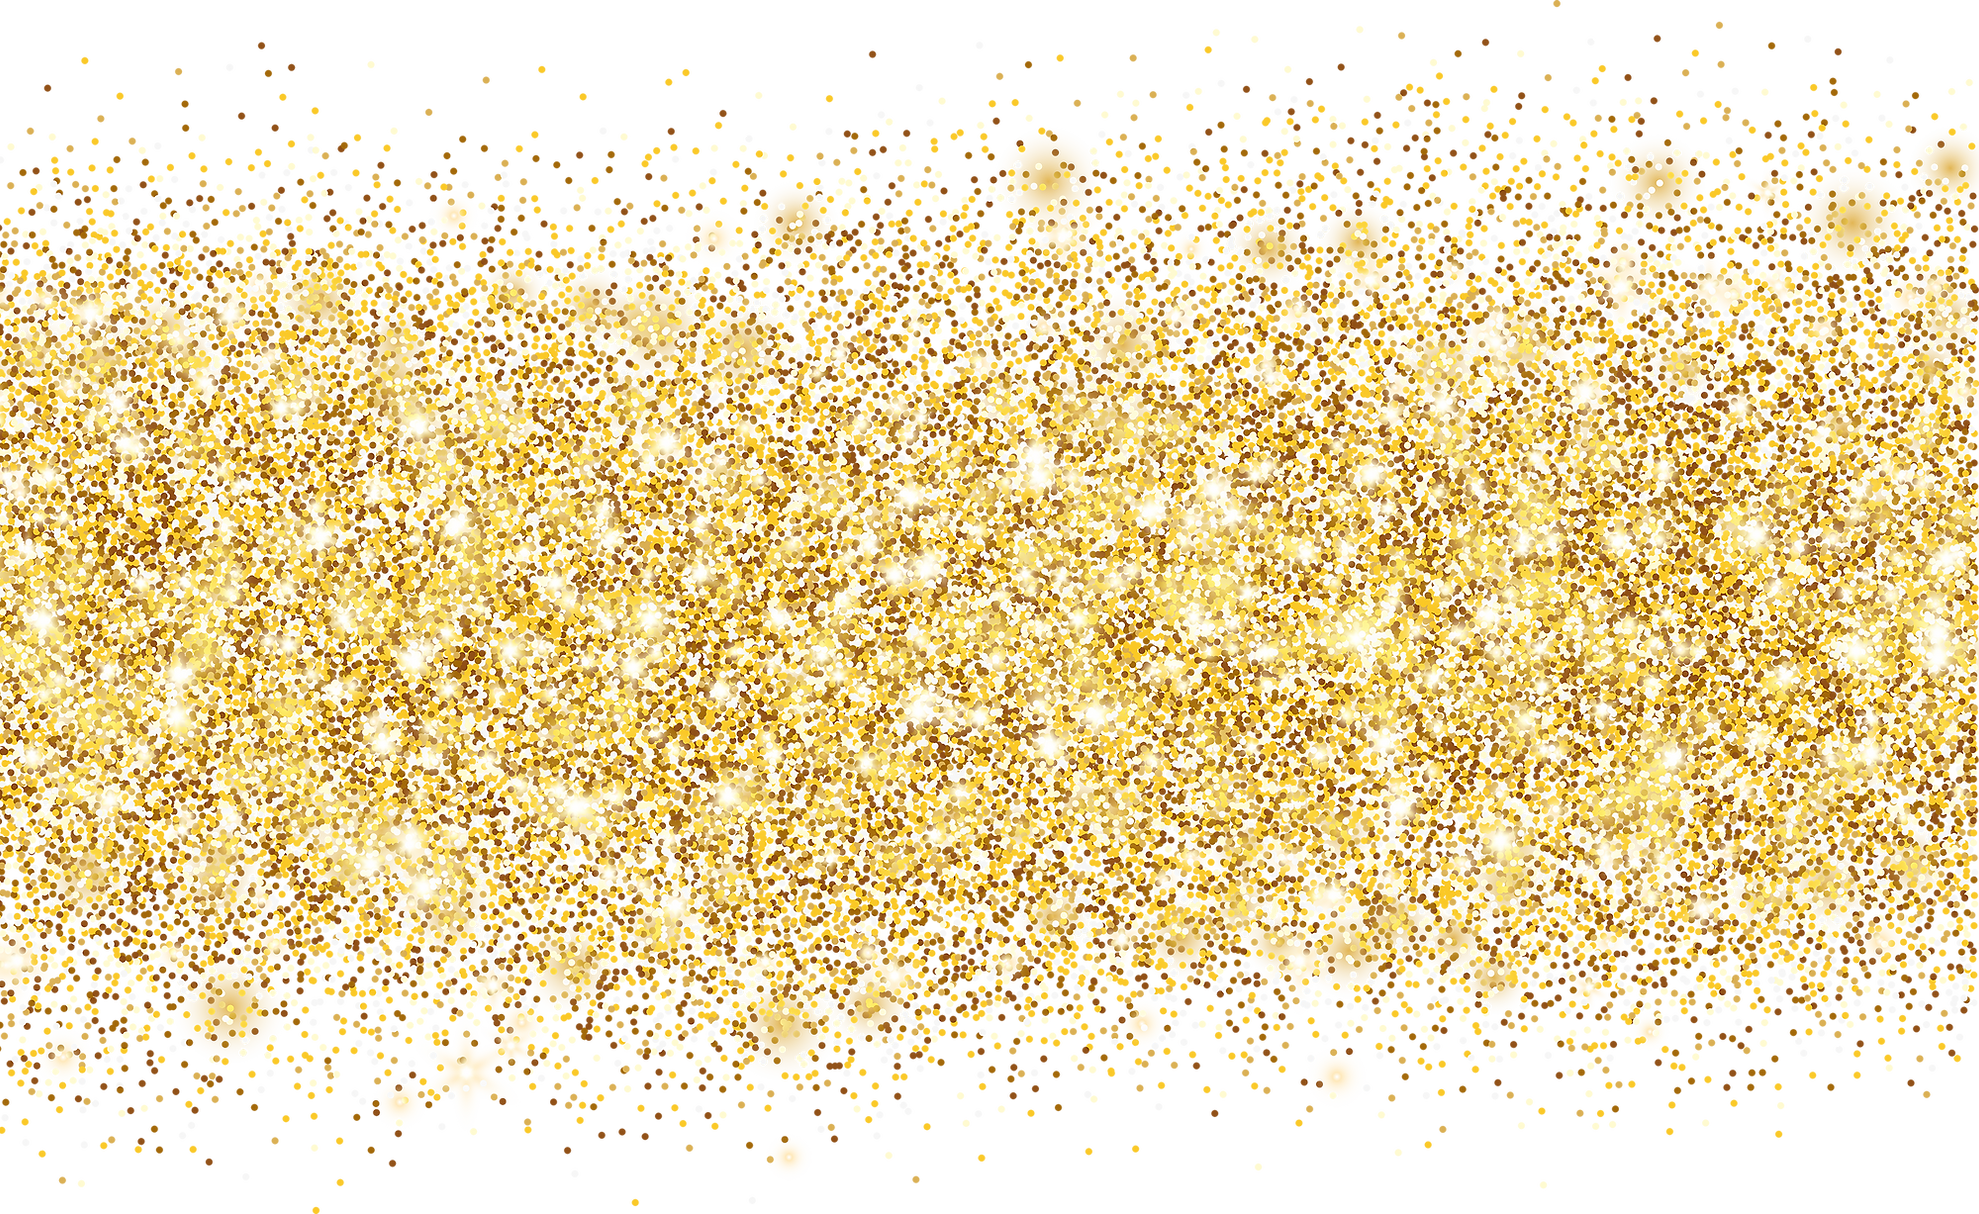 pngfind.com-gold-sparkles-png-227349.png